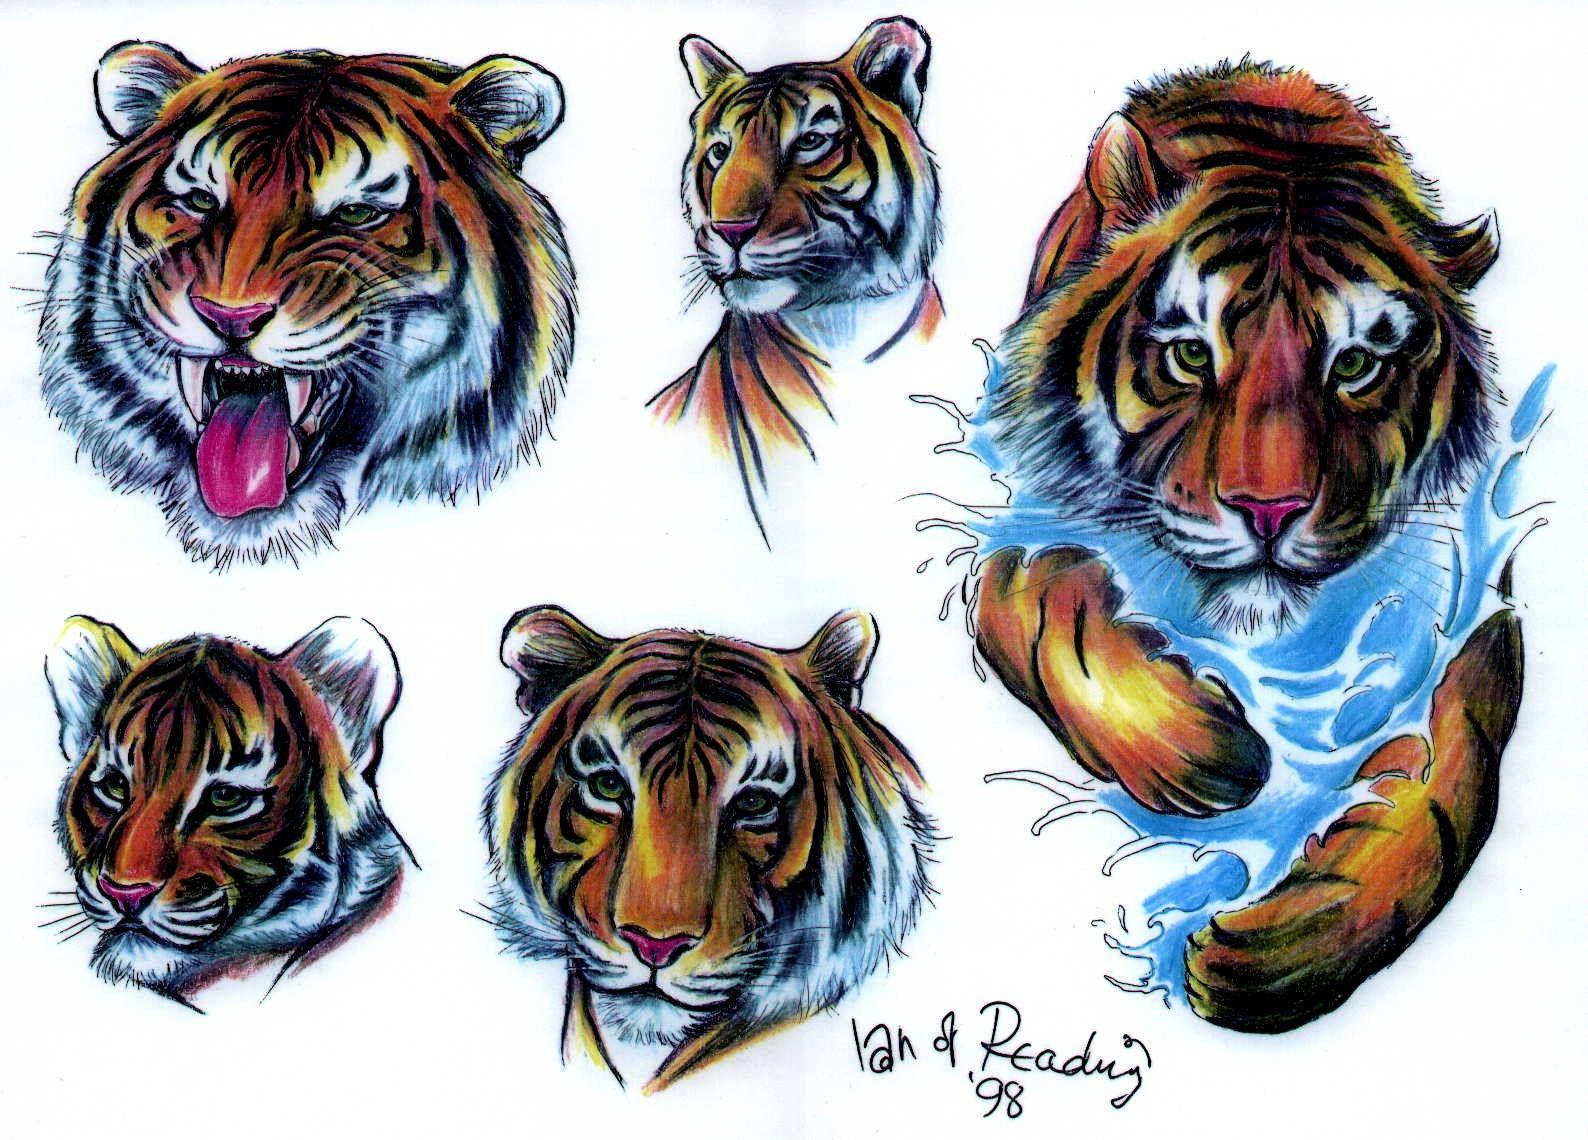 Tiger Wallpaper Free Tiger Category Tiger Wallpaper Tiger Tattoo Tattoo Flash Art Tiger tattoo wallpaper free download